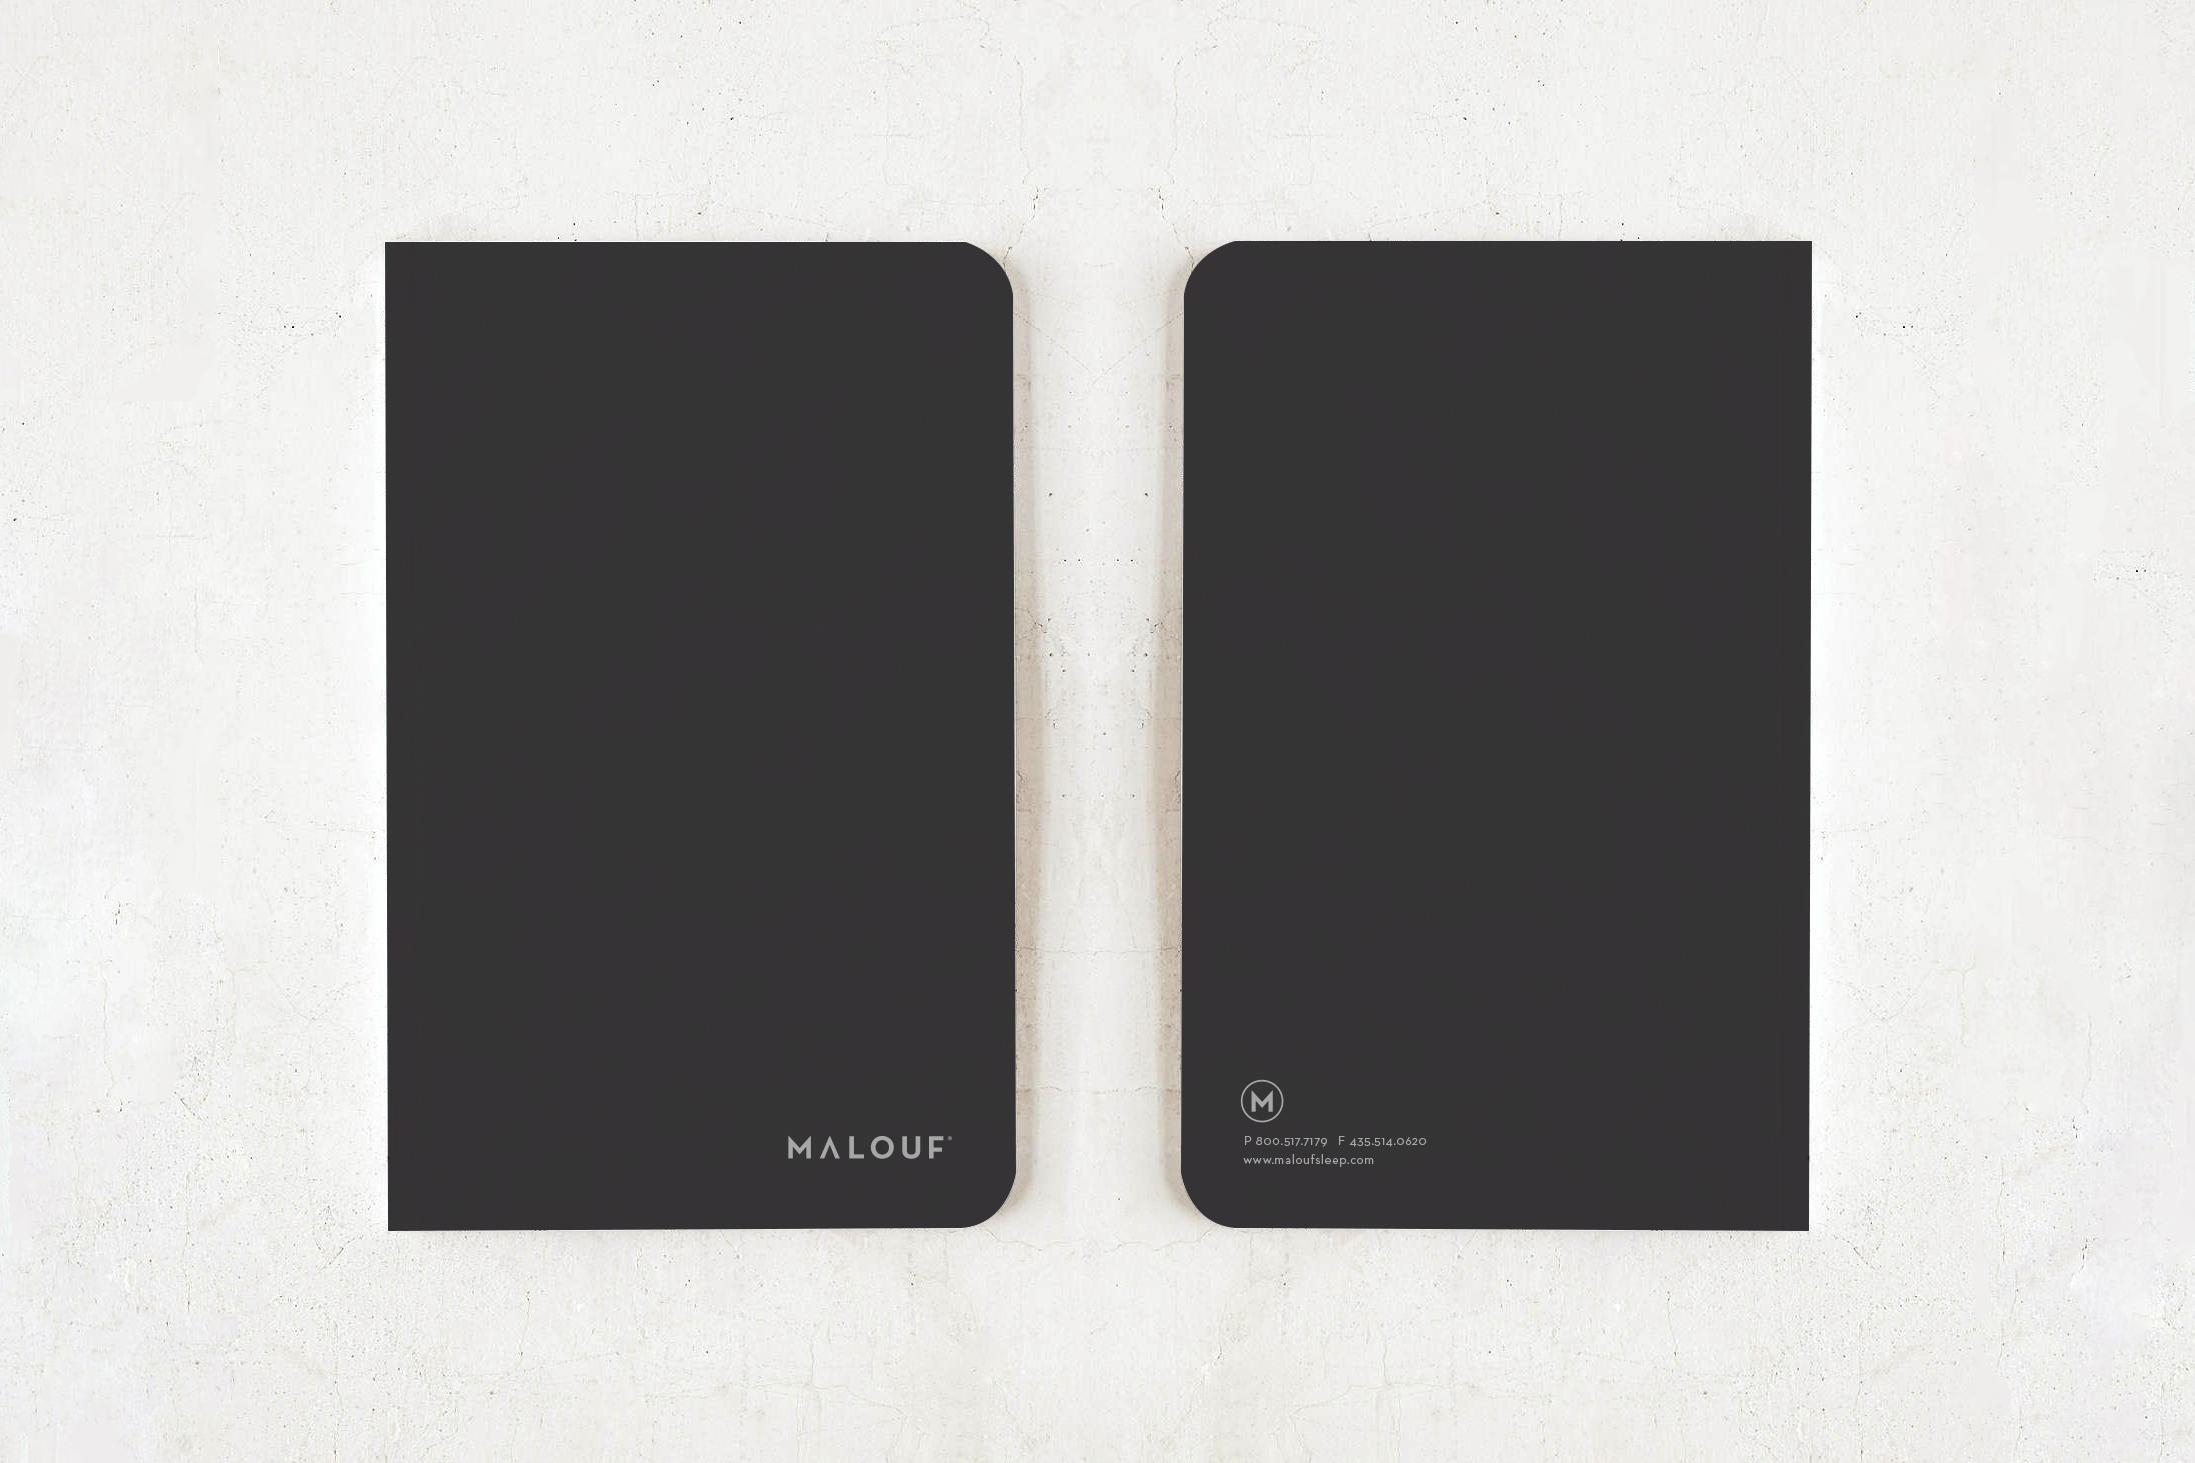 MALOUF_Notebooks_Option1.jpg